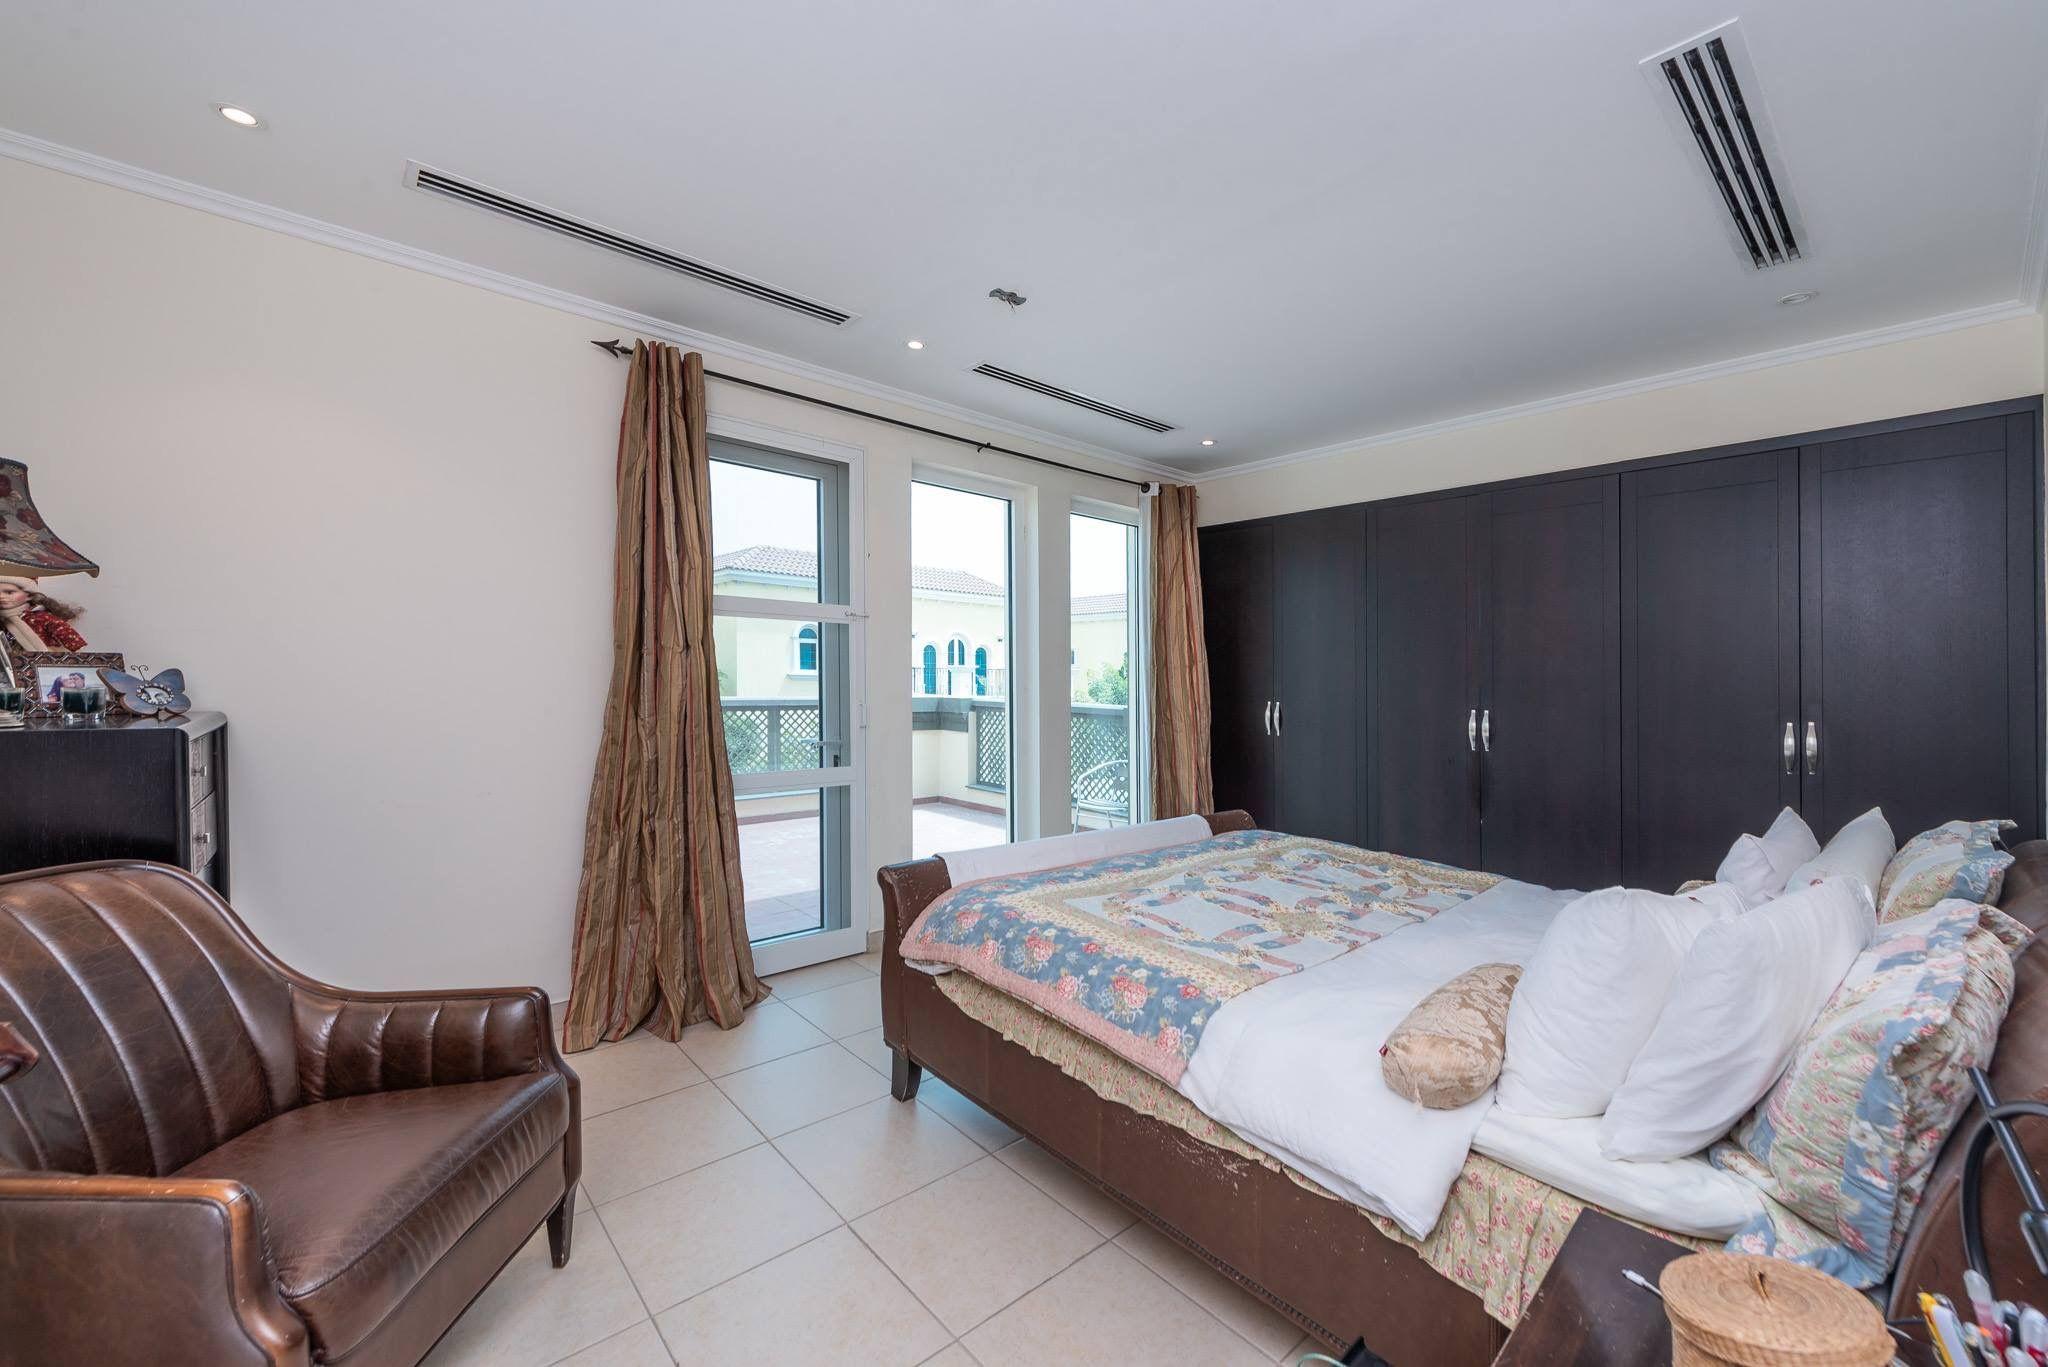 Jumeirah Park villa for sale Home, Family room, Room